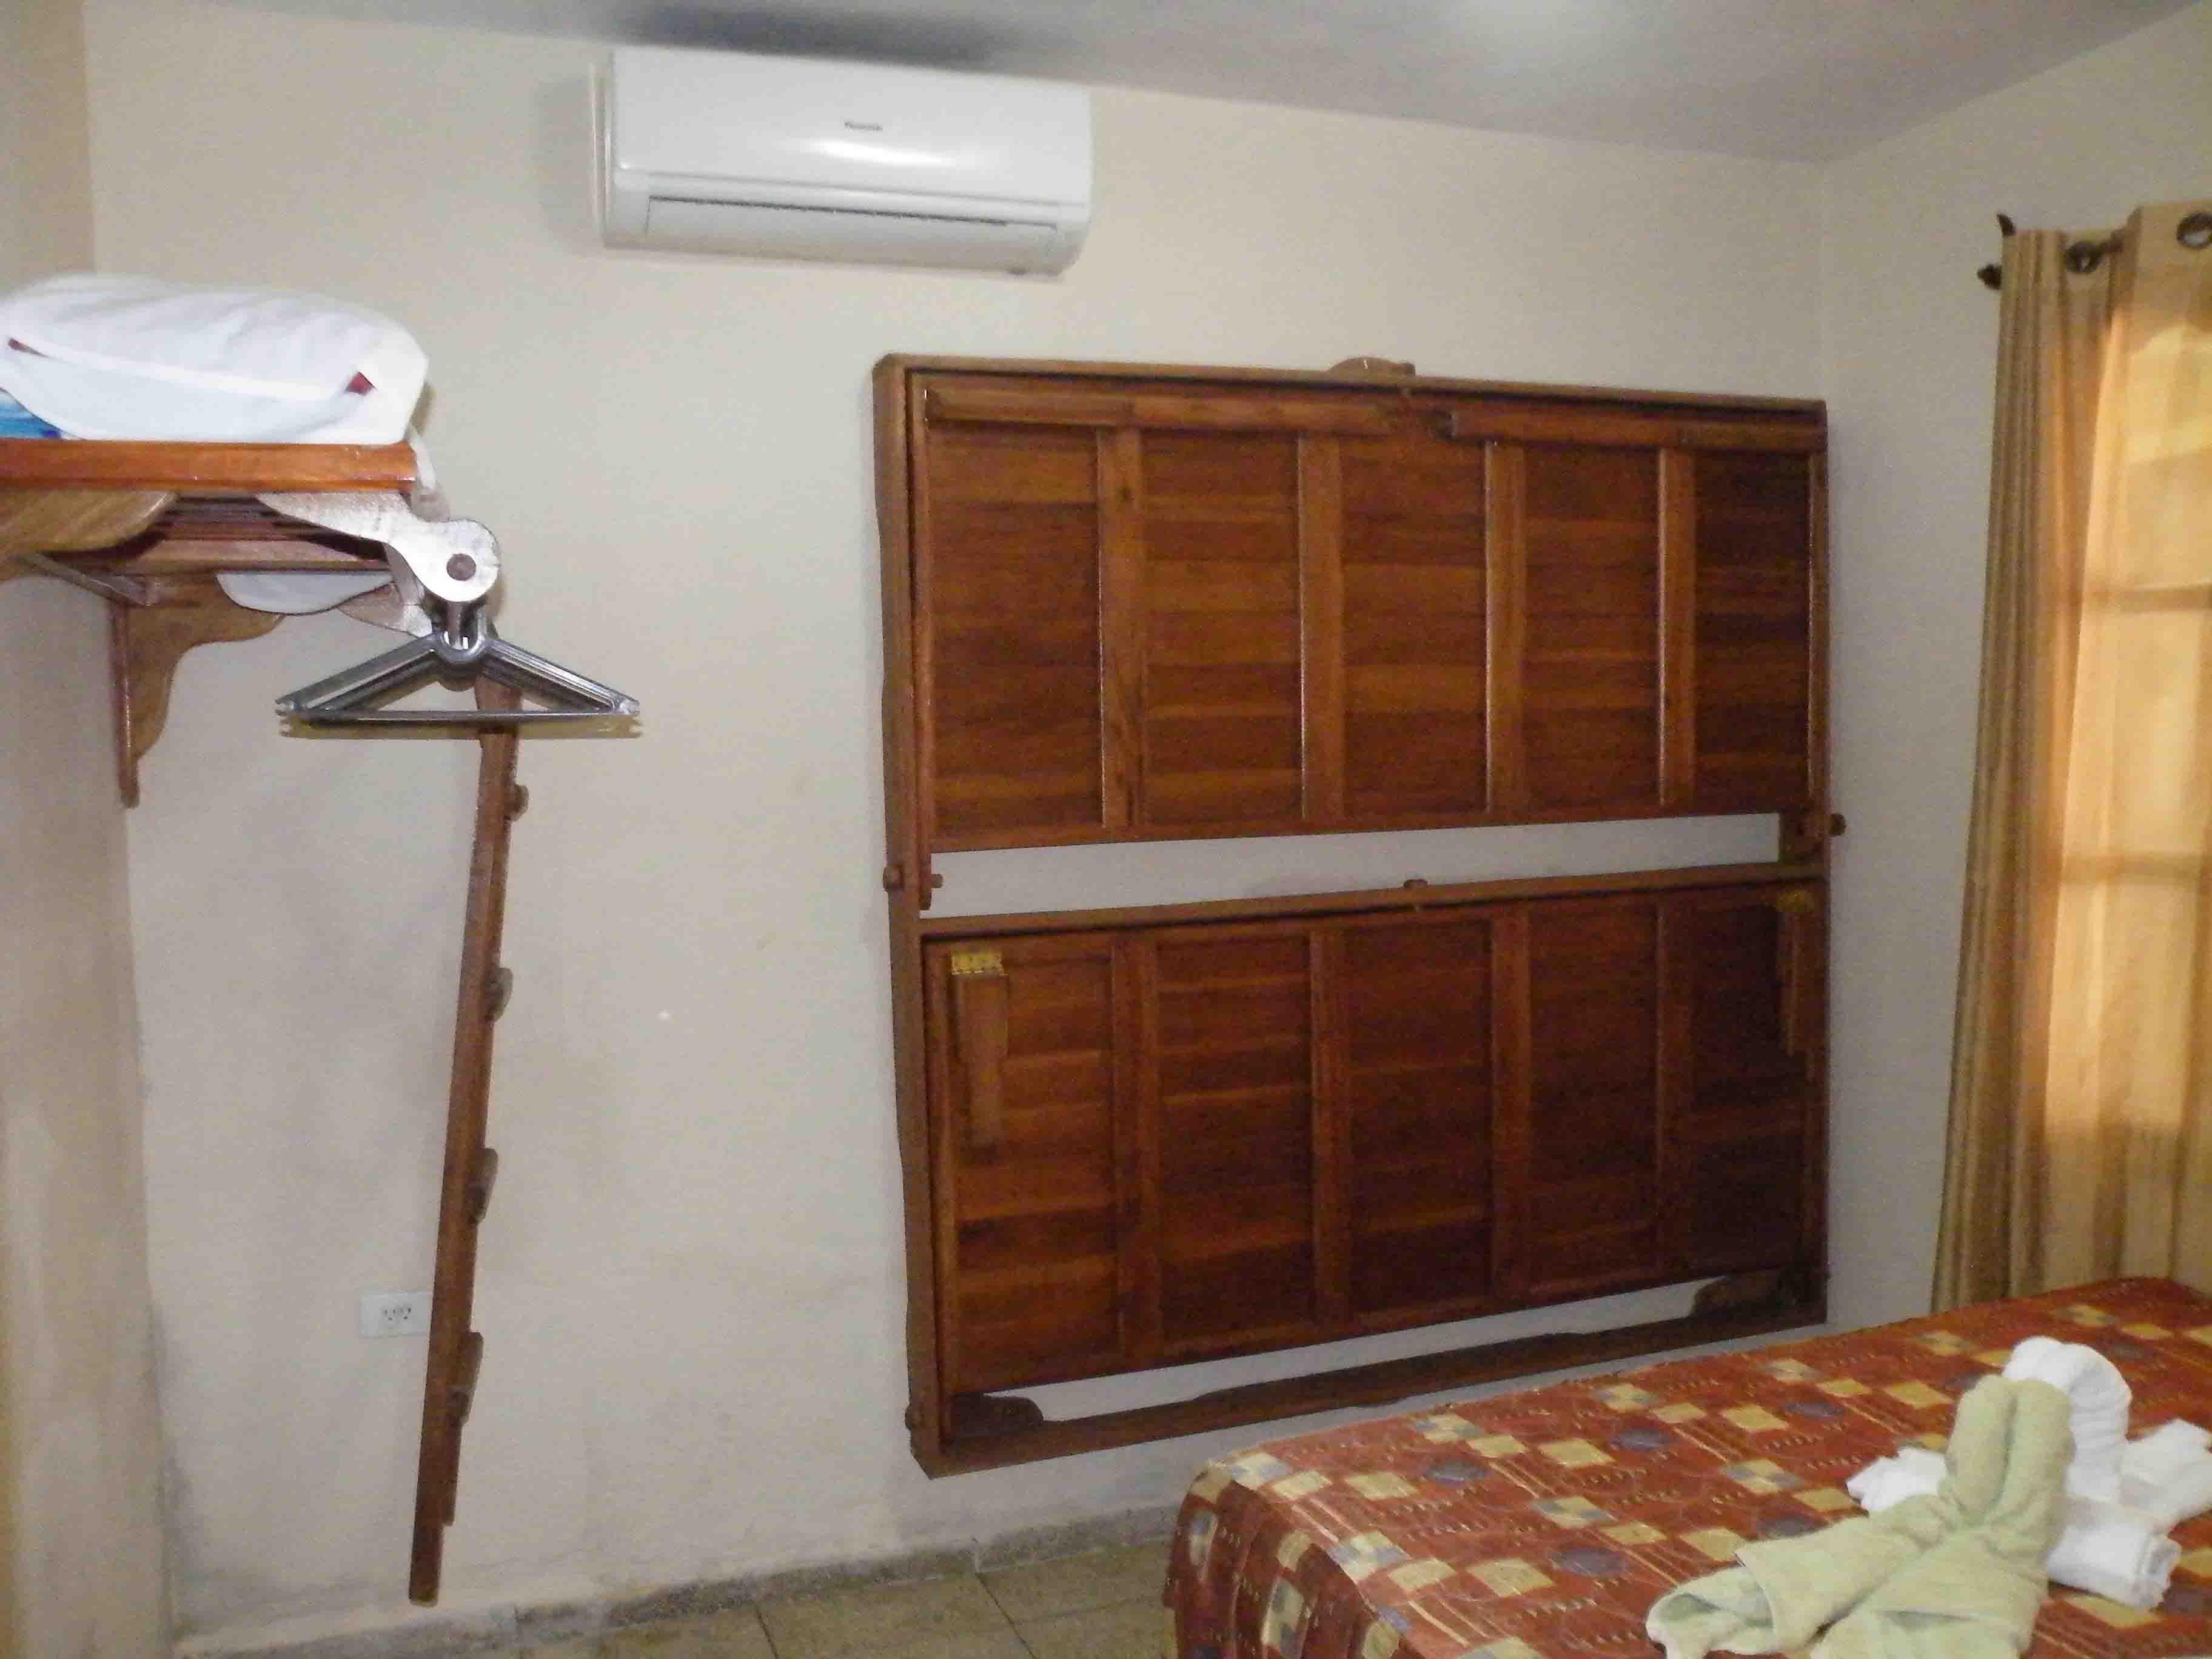 PYL001 – Room 1 Quadruple room with private bathroom